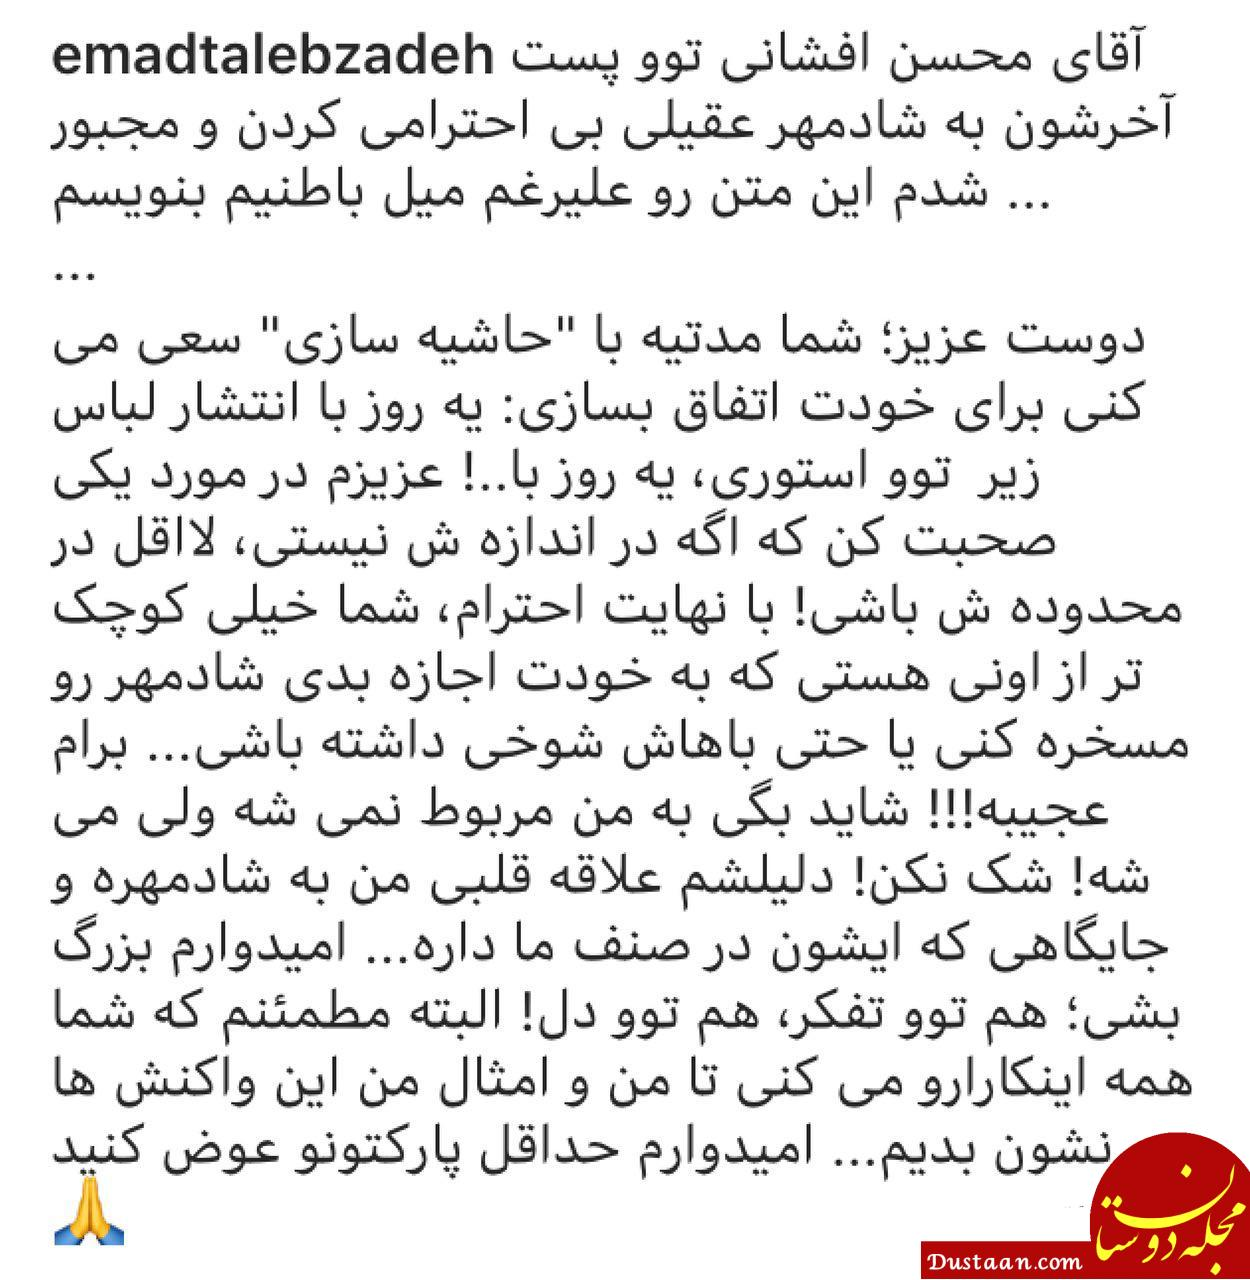 www.dustaan.com حمله تند طالب زاده به محسن افشانی در حمایت از شادمهر عقیلی +فیلم و عکس